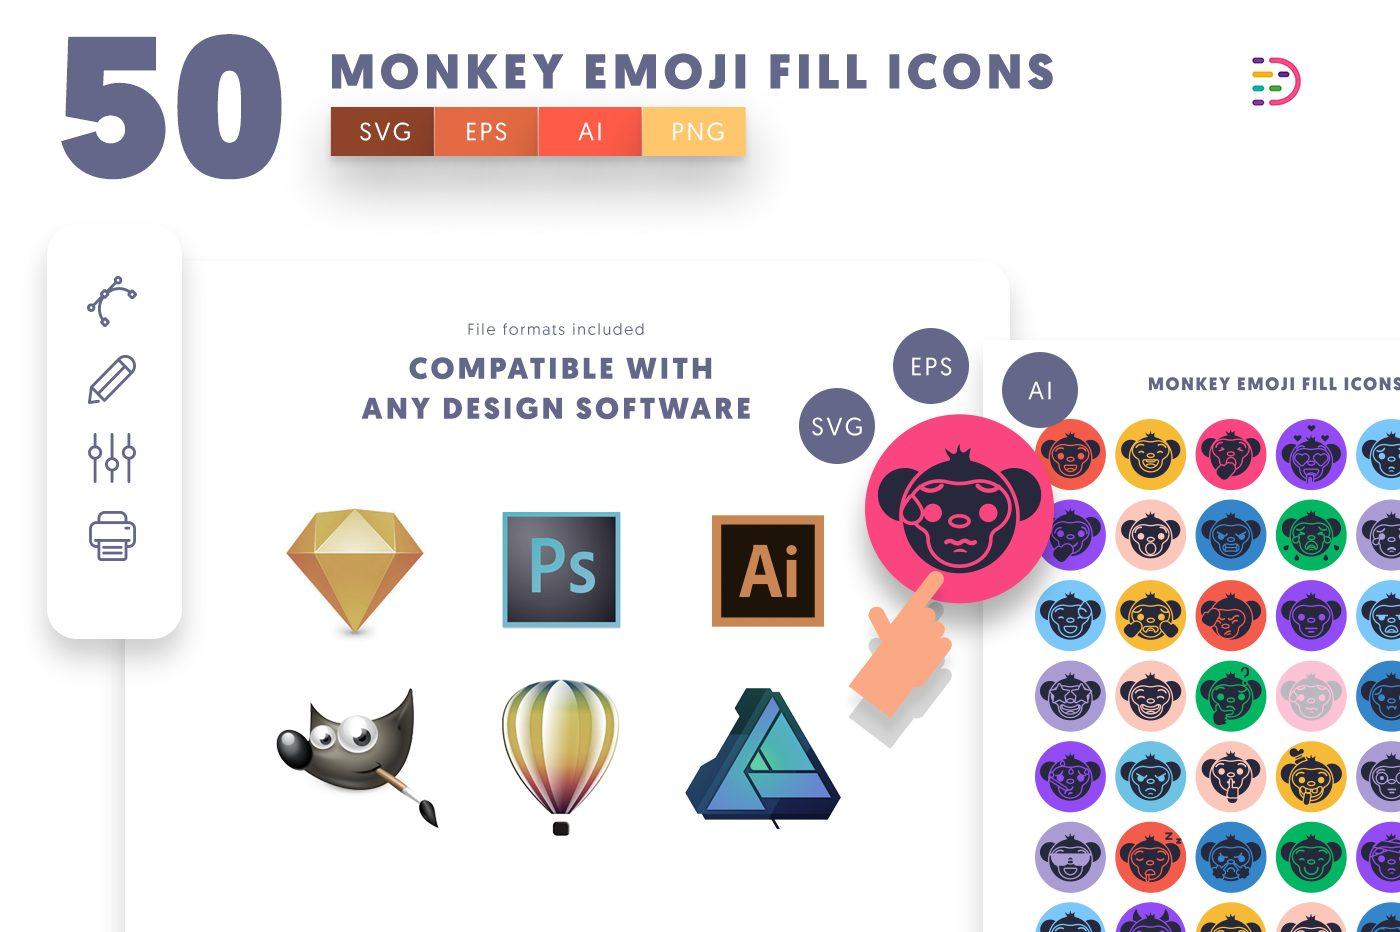 full vector 50 Monkey Emoji Fill Icons EPS, SVG, PNG